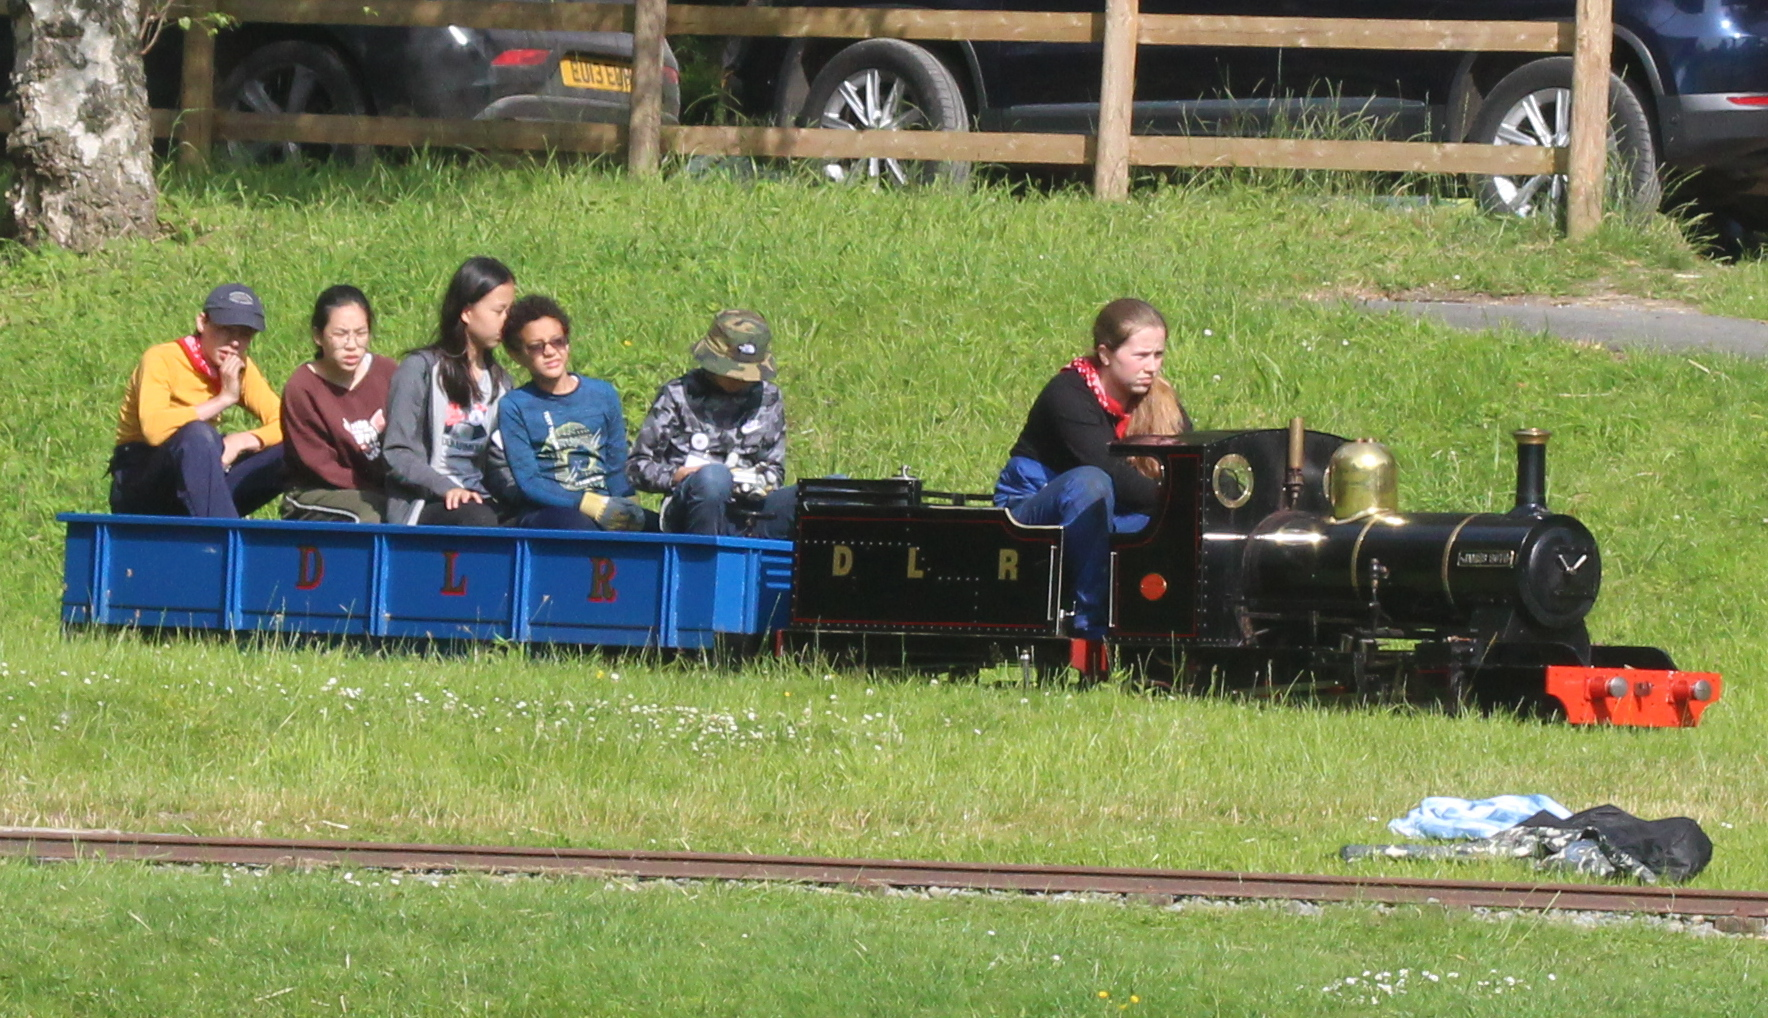 Children taken for a ride in miniature steam train